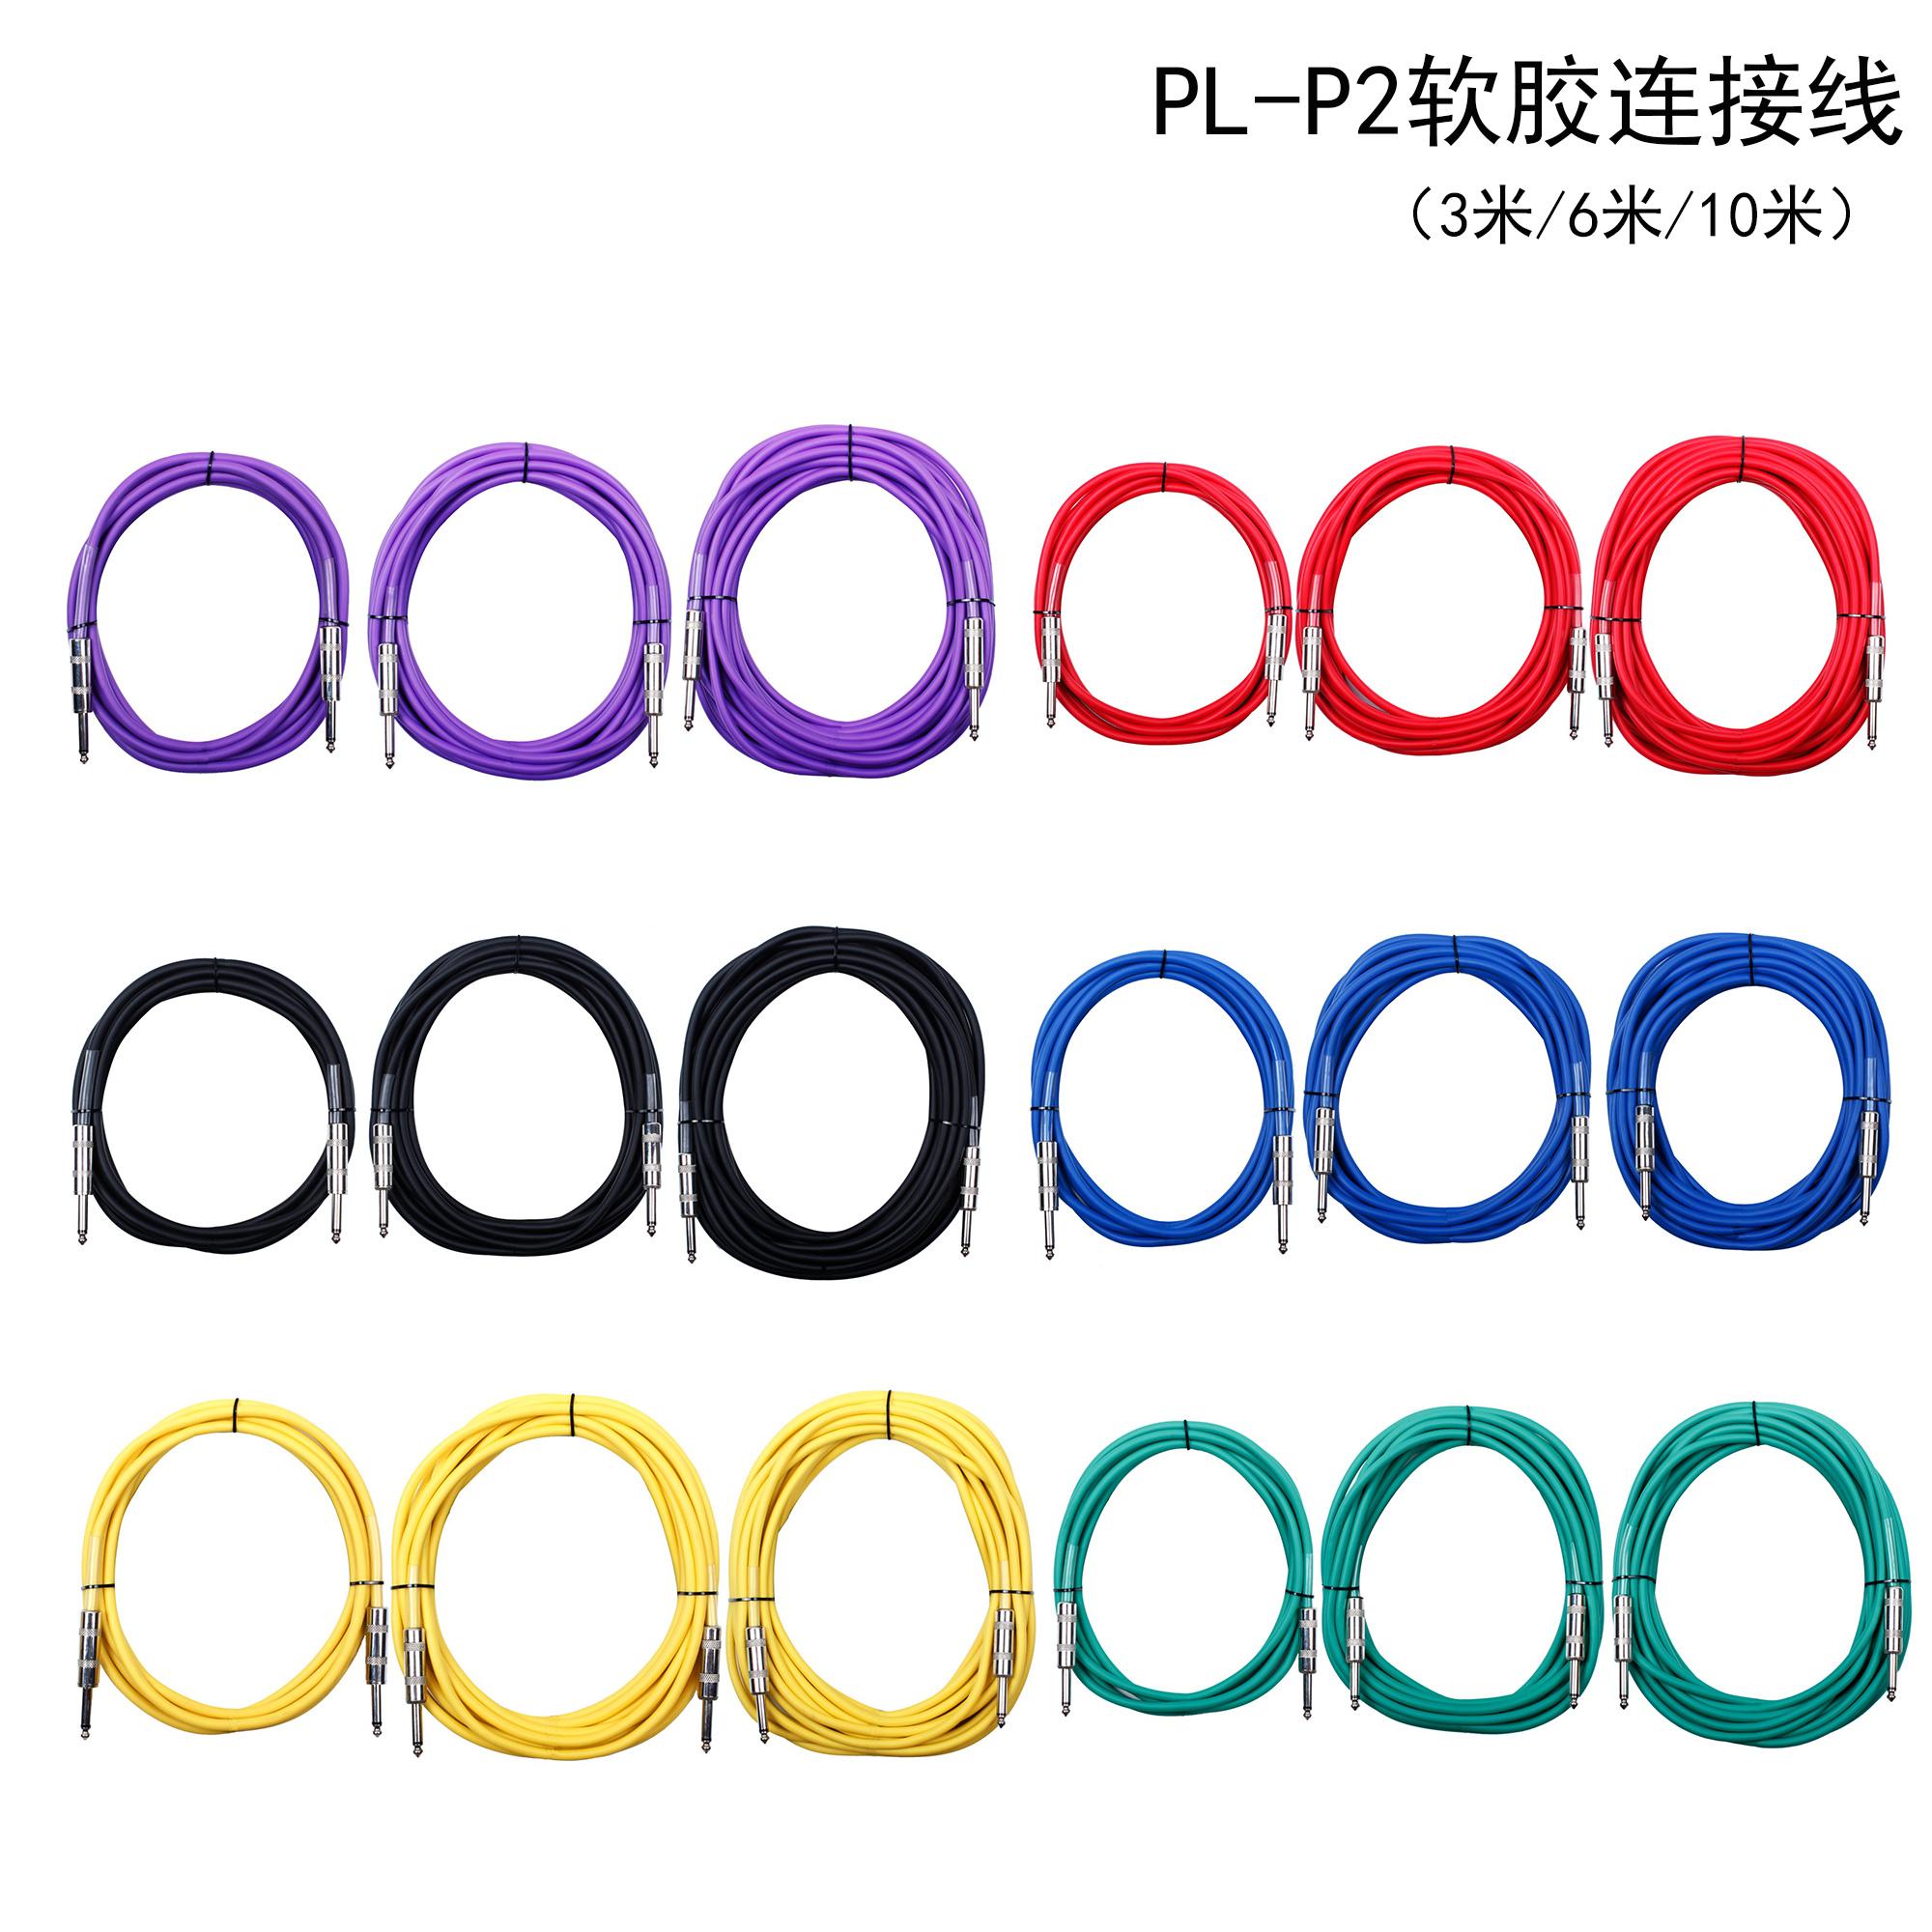 PL-P2(3米/6米/10米)软胶连接线